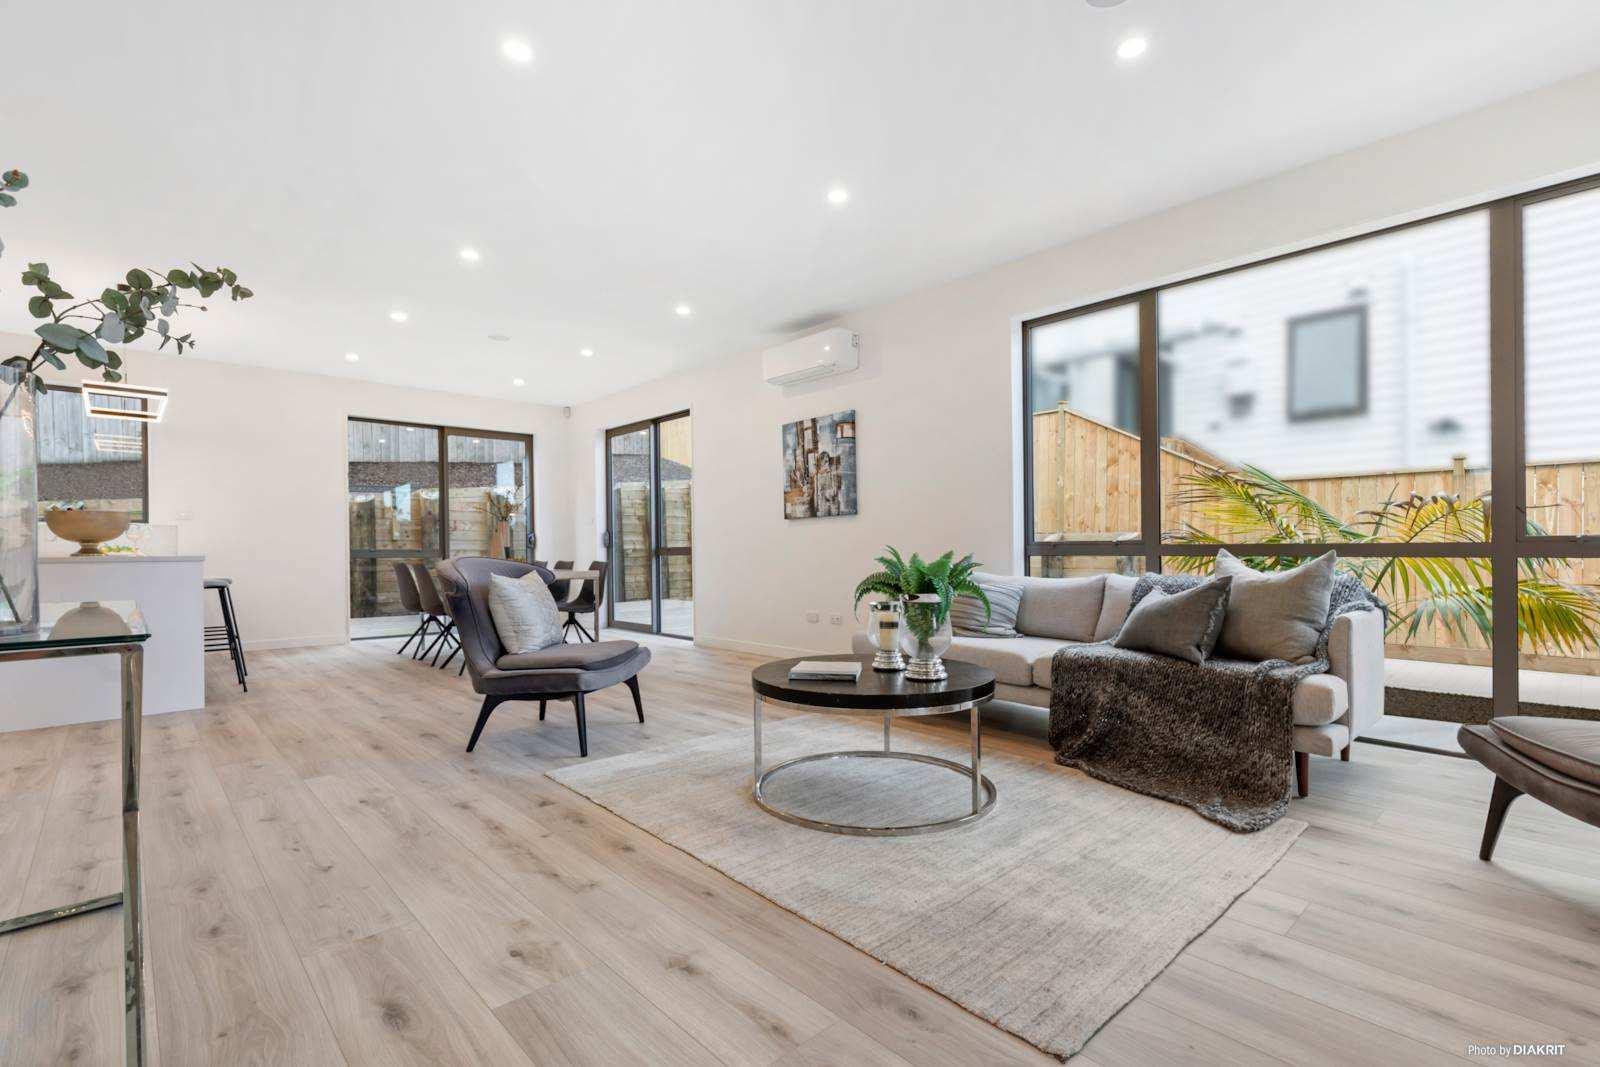 Birkenhead 5房 大户型全新靓宅 双层灵动格局 高端家居设施 步行直达学校&购物中心 即刻享受精致生活 Executive Living, Superb Location with Granny Flat